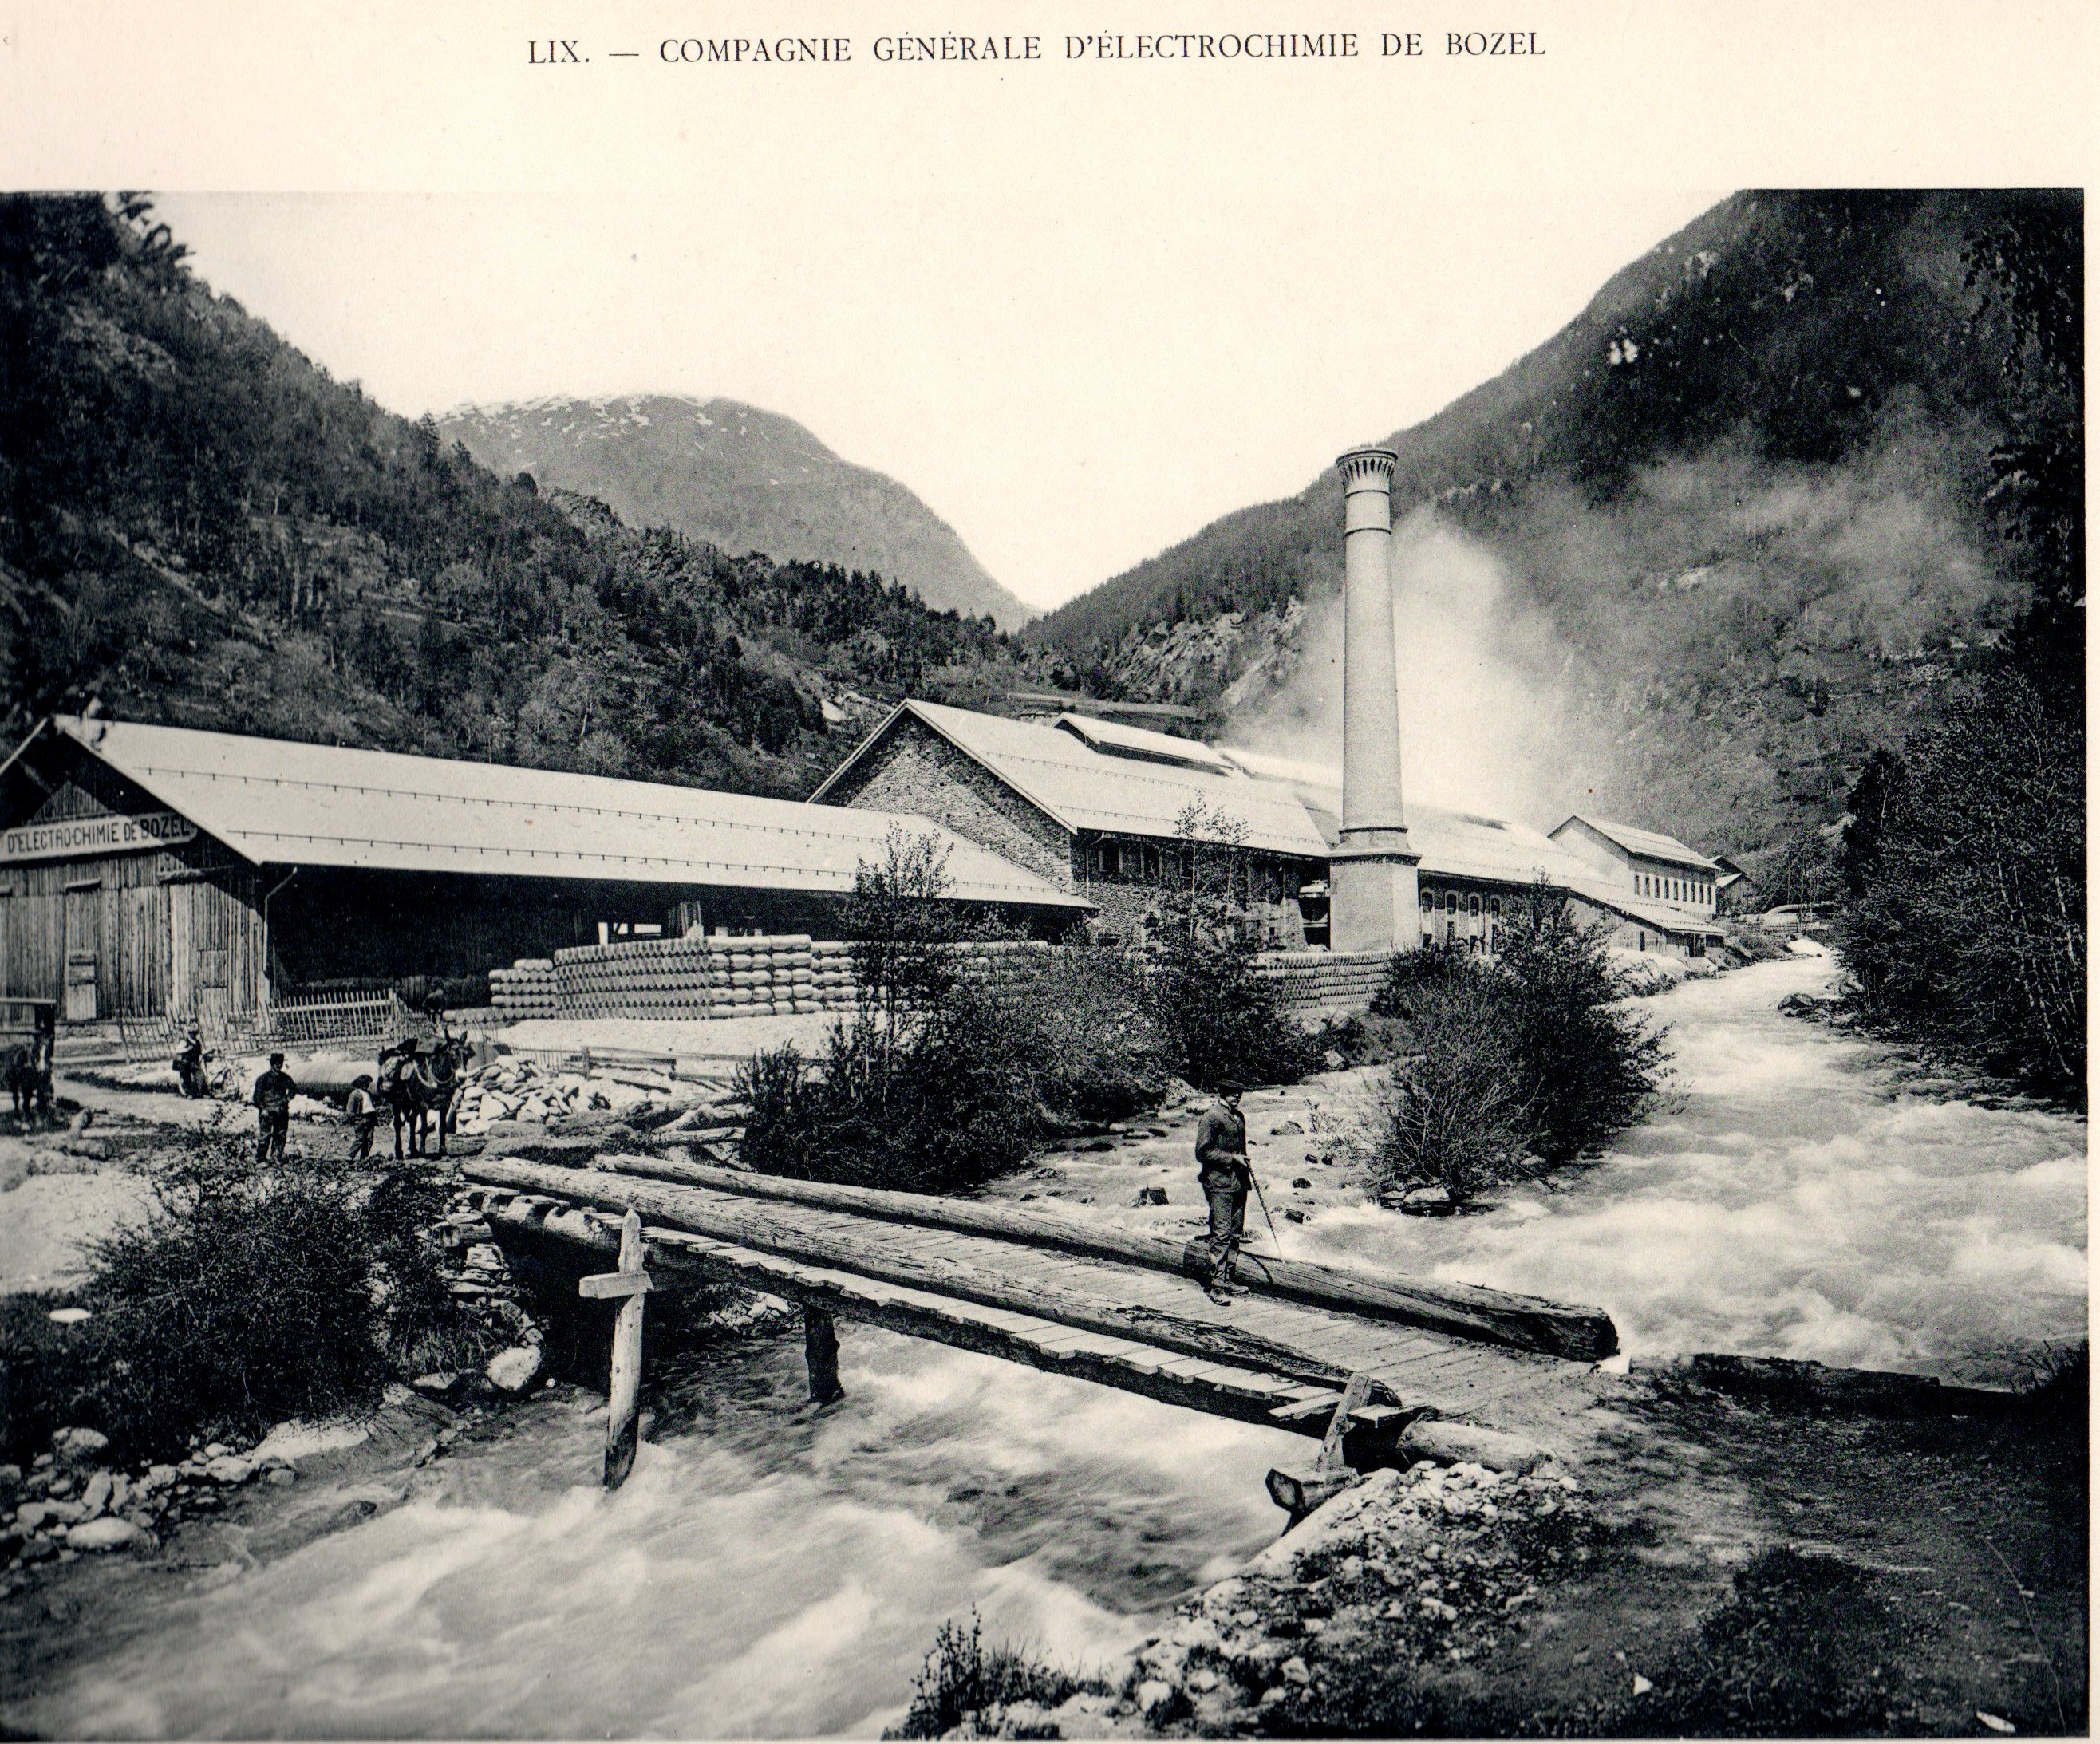 usine-de-bozel